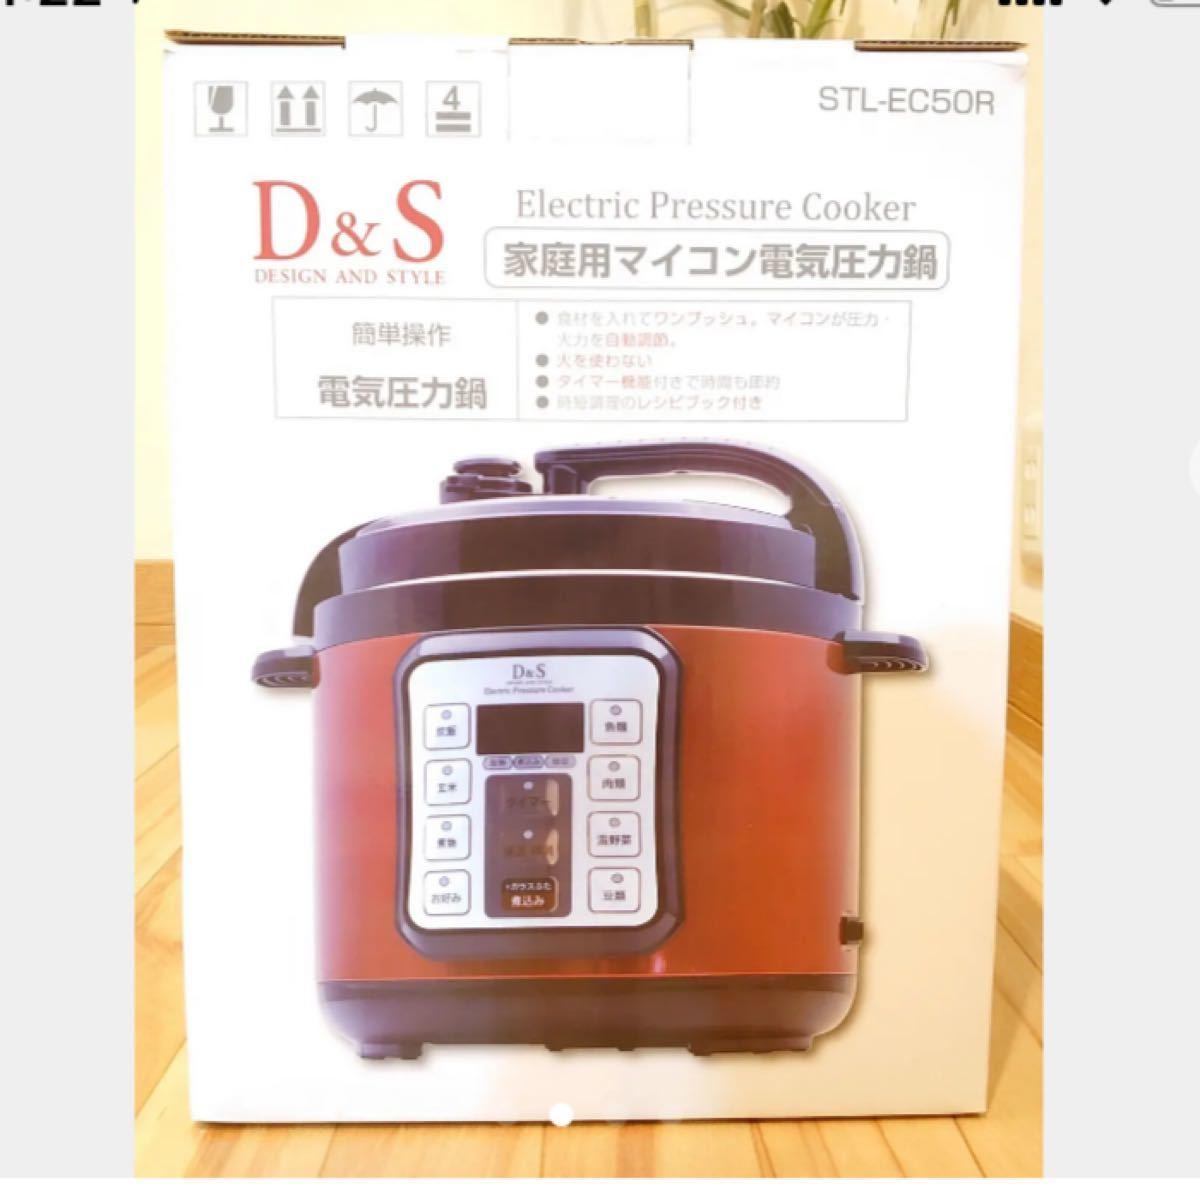 D&S電気圧力鍋4リットル 即発送!